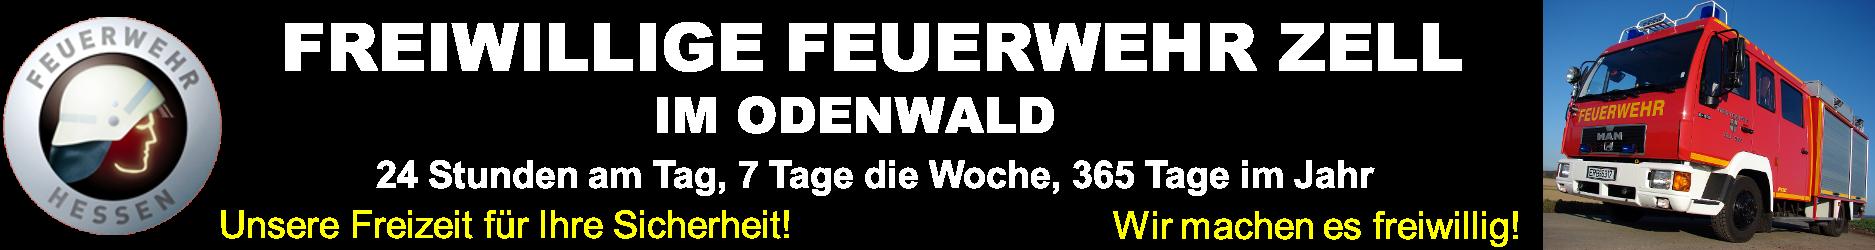 Freiwillige Feuerwehr Zell/Odw.